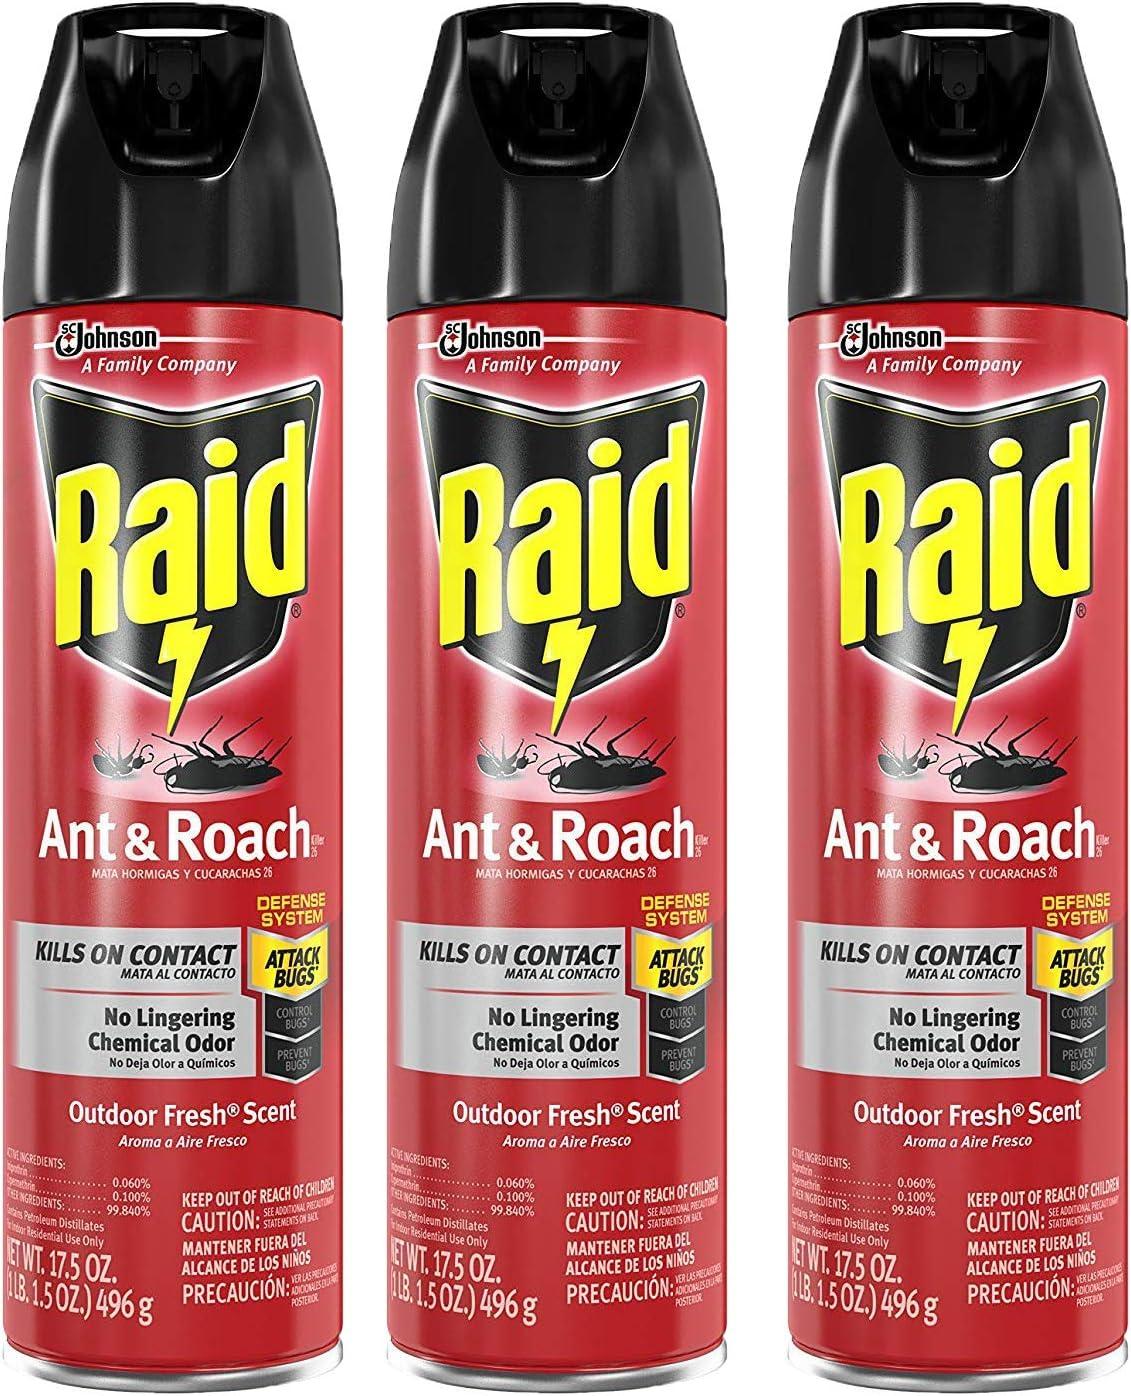 Raid Ant & Roach Killer Defense System, Outdoor Fresh Scent, 17.5 OZ (Pack - 3)